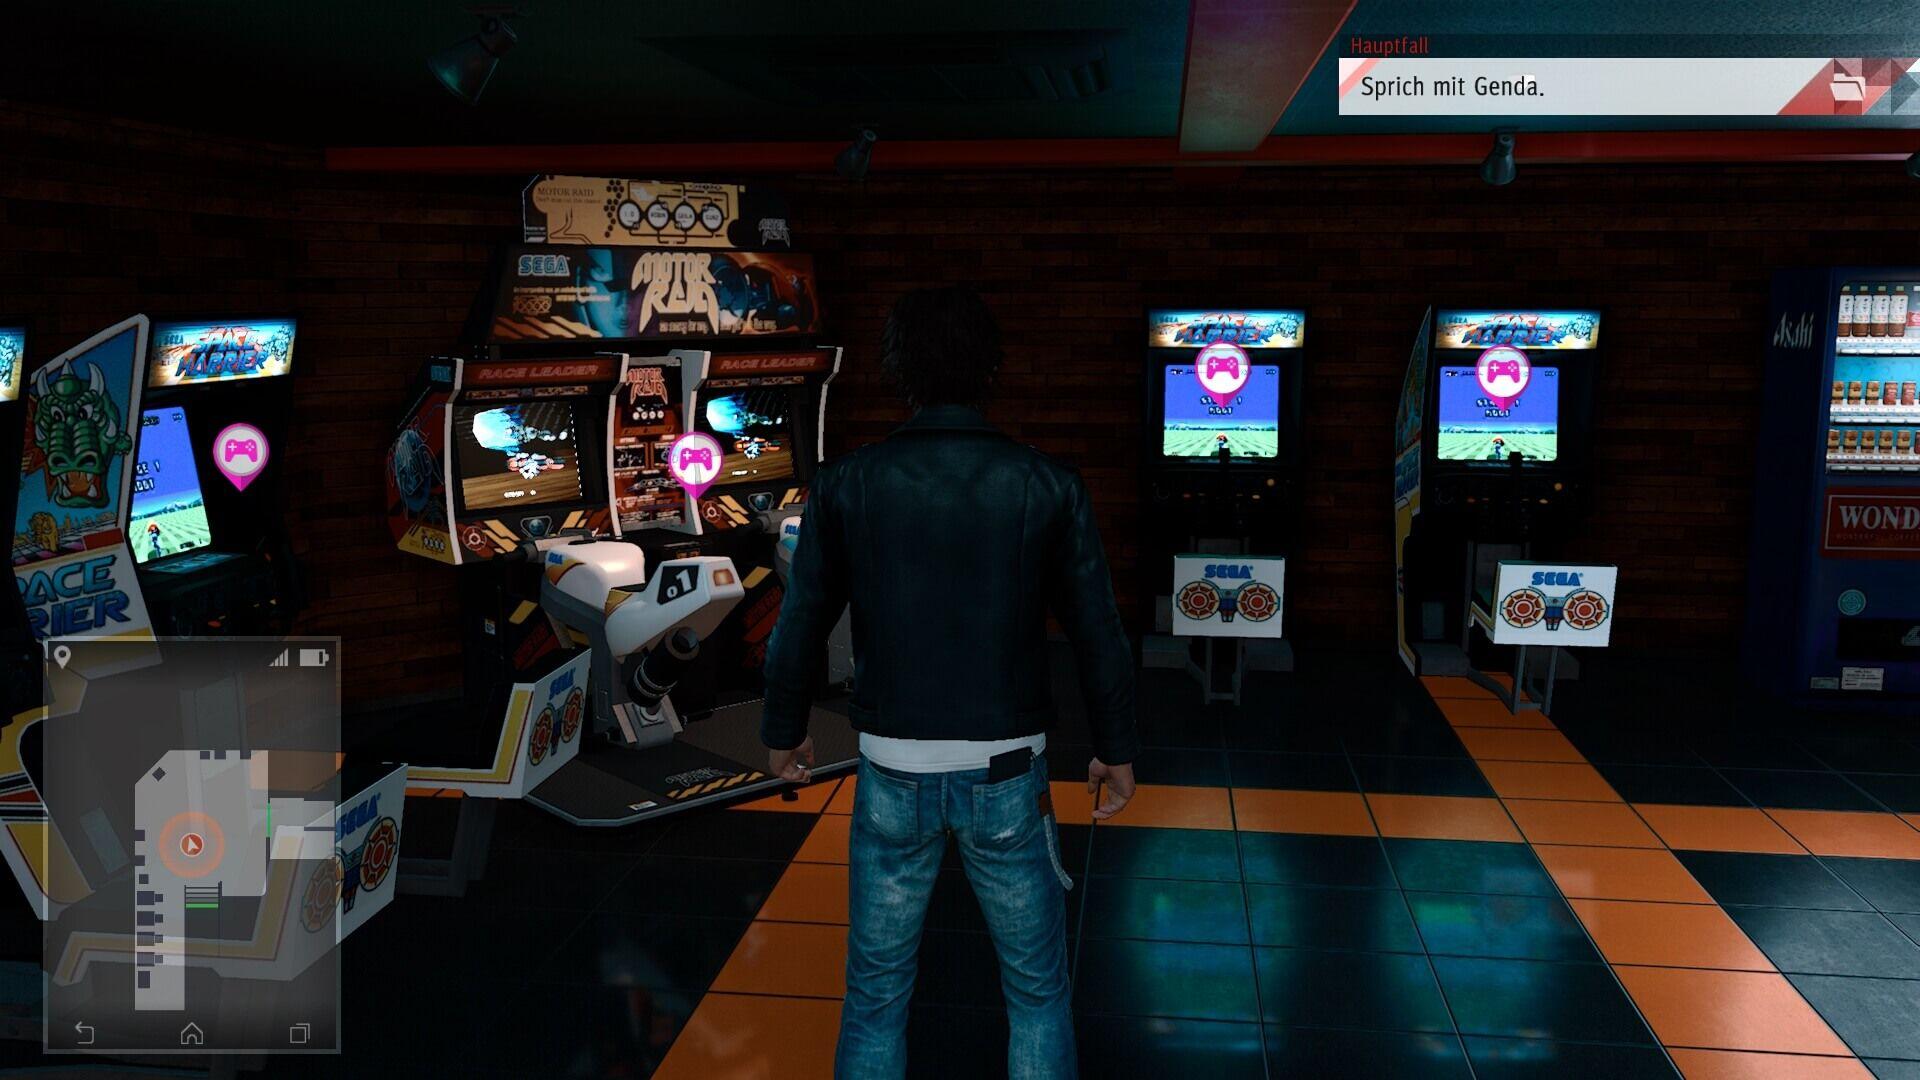 Judgment Spielhalle Sega Club